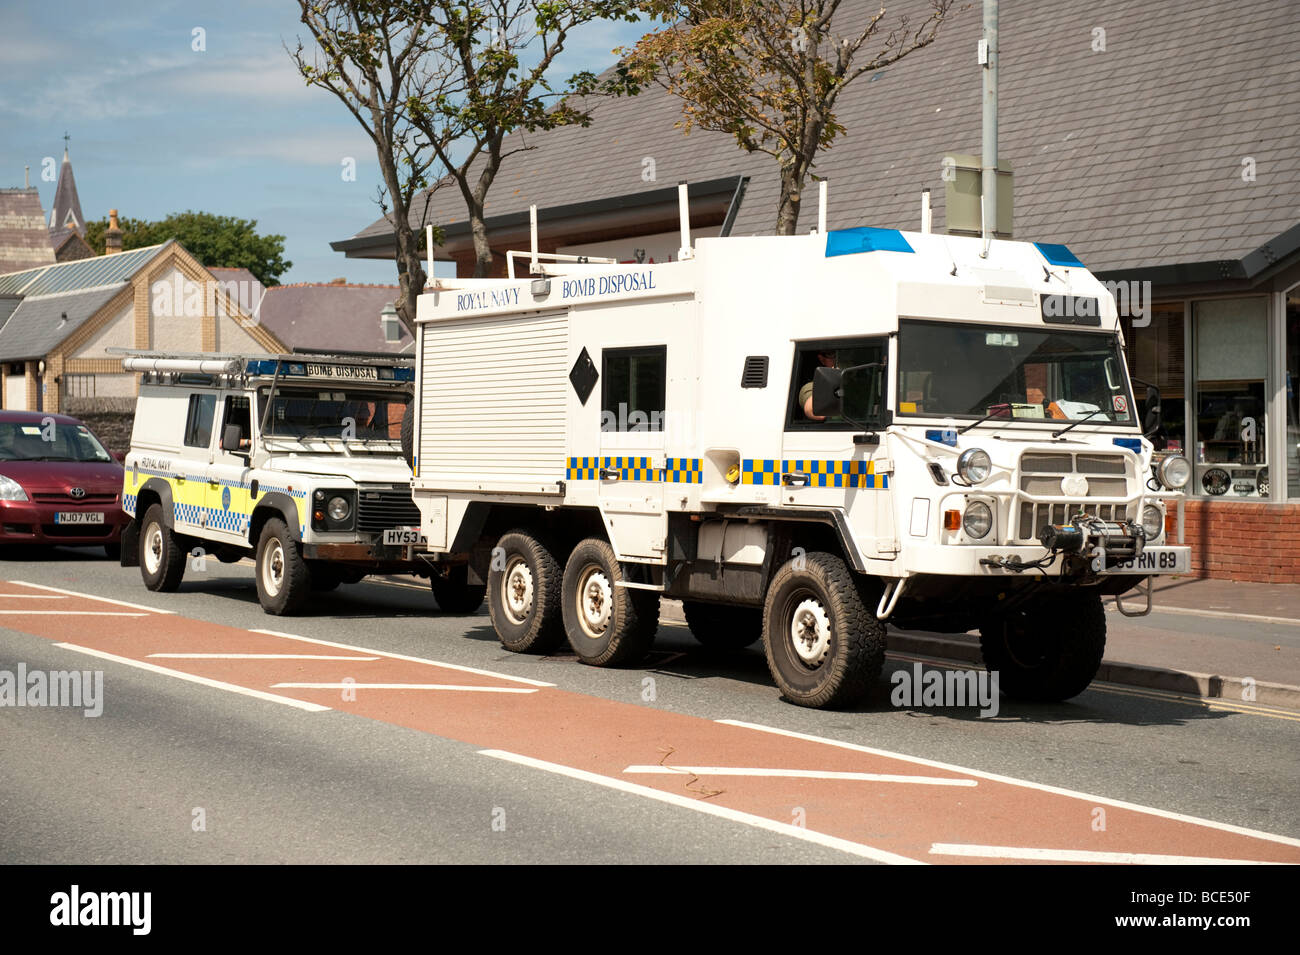 La Marine britannique Bomb Disposal véhicules Photo Stock